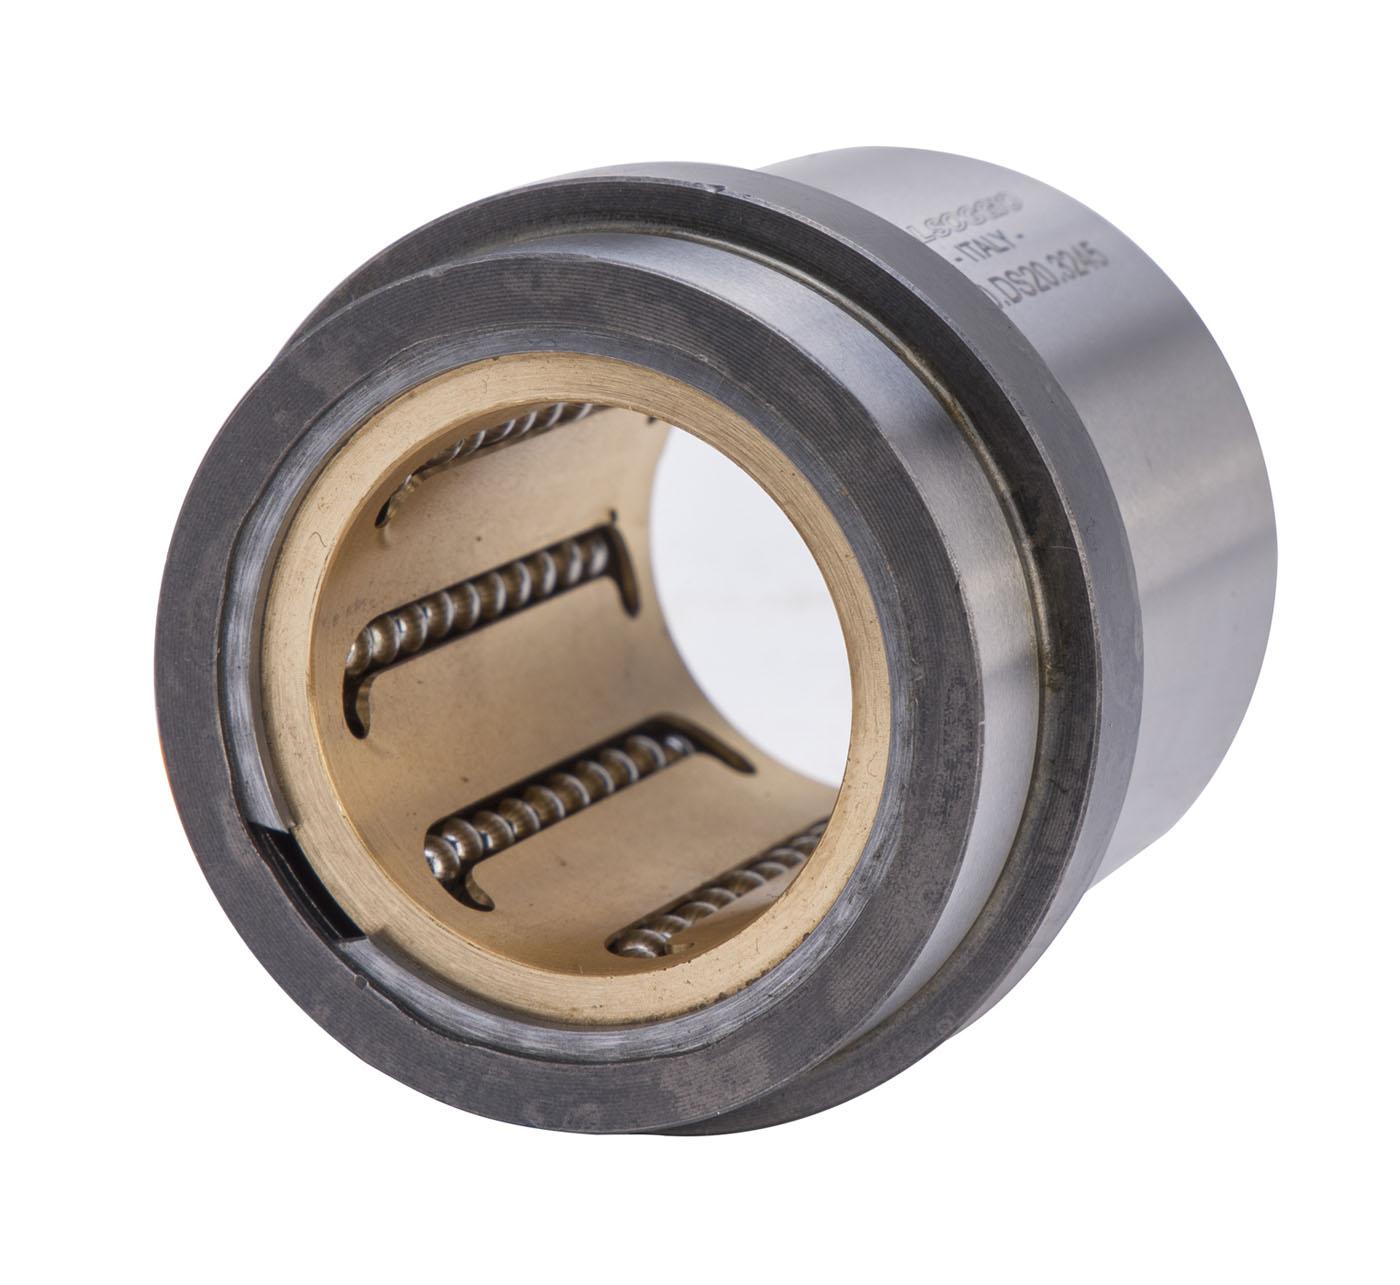 recirculating-ball-bushings-high-load